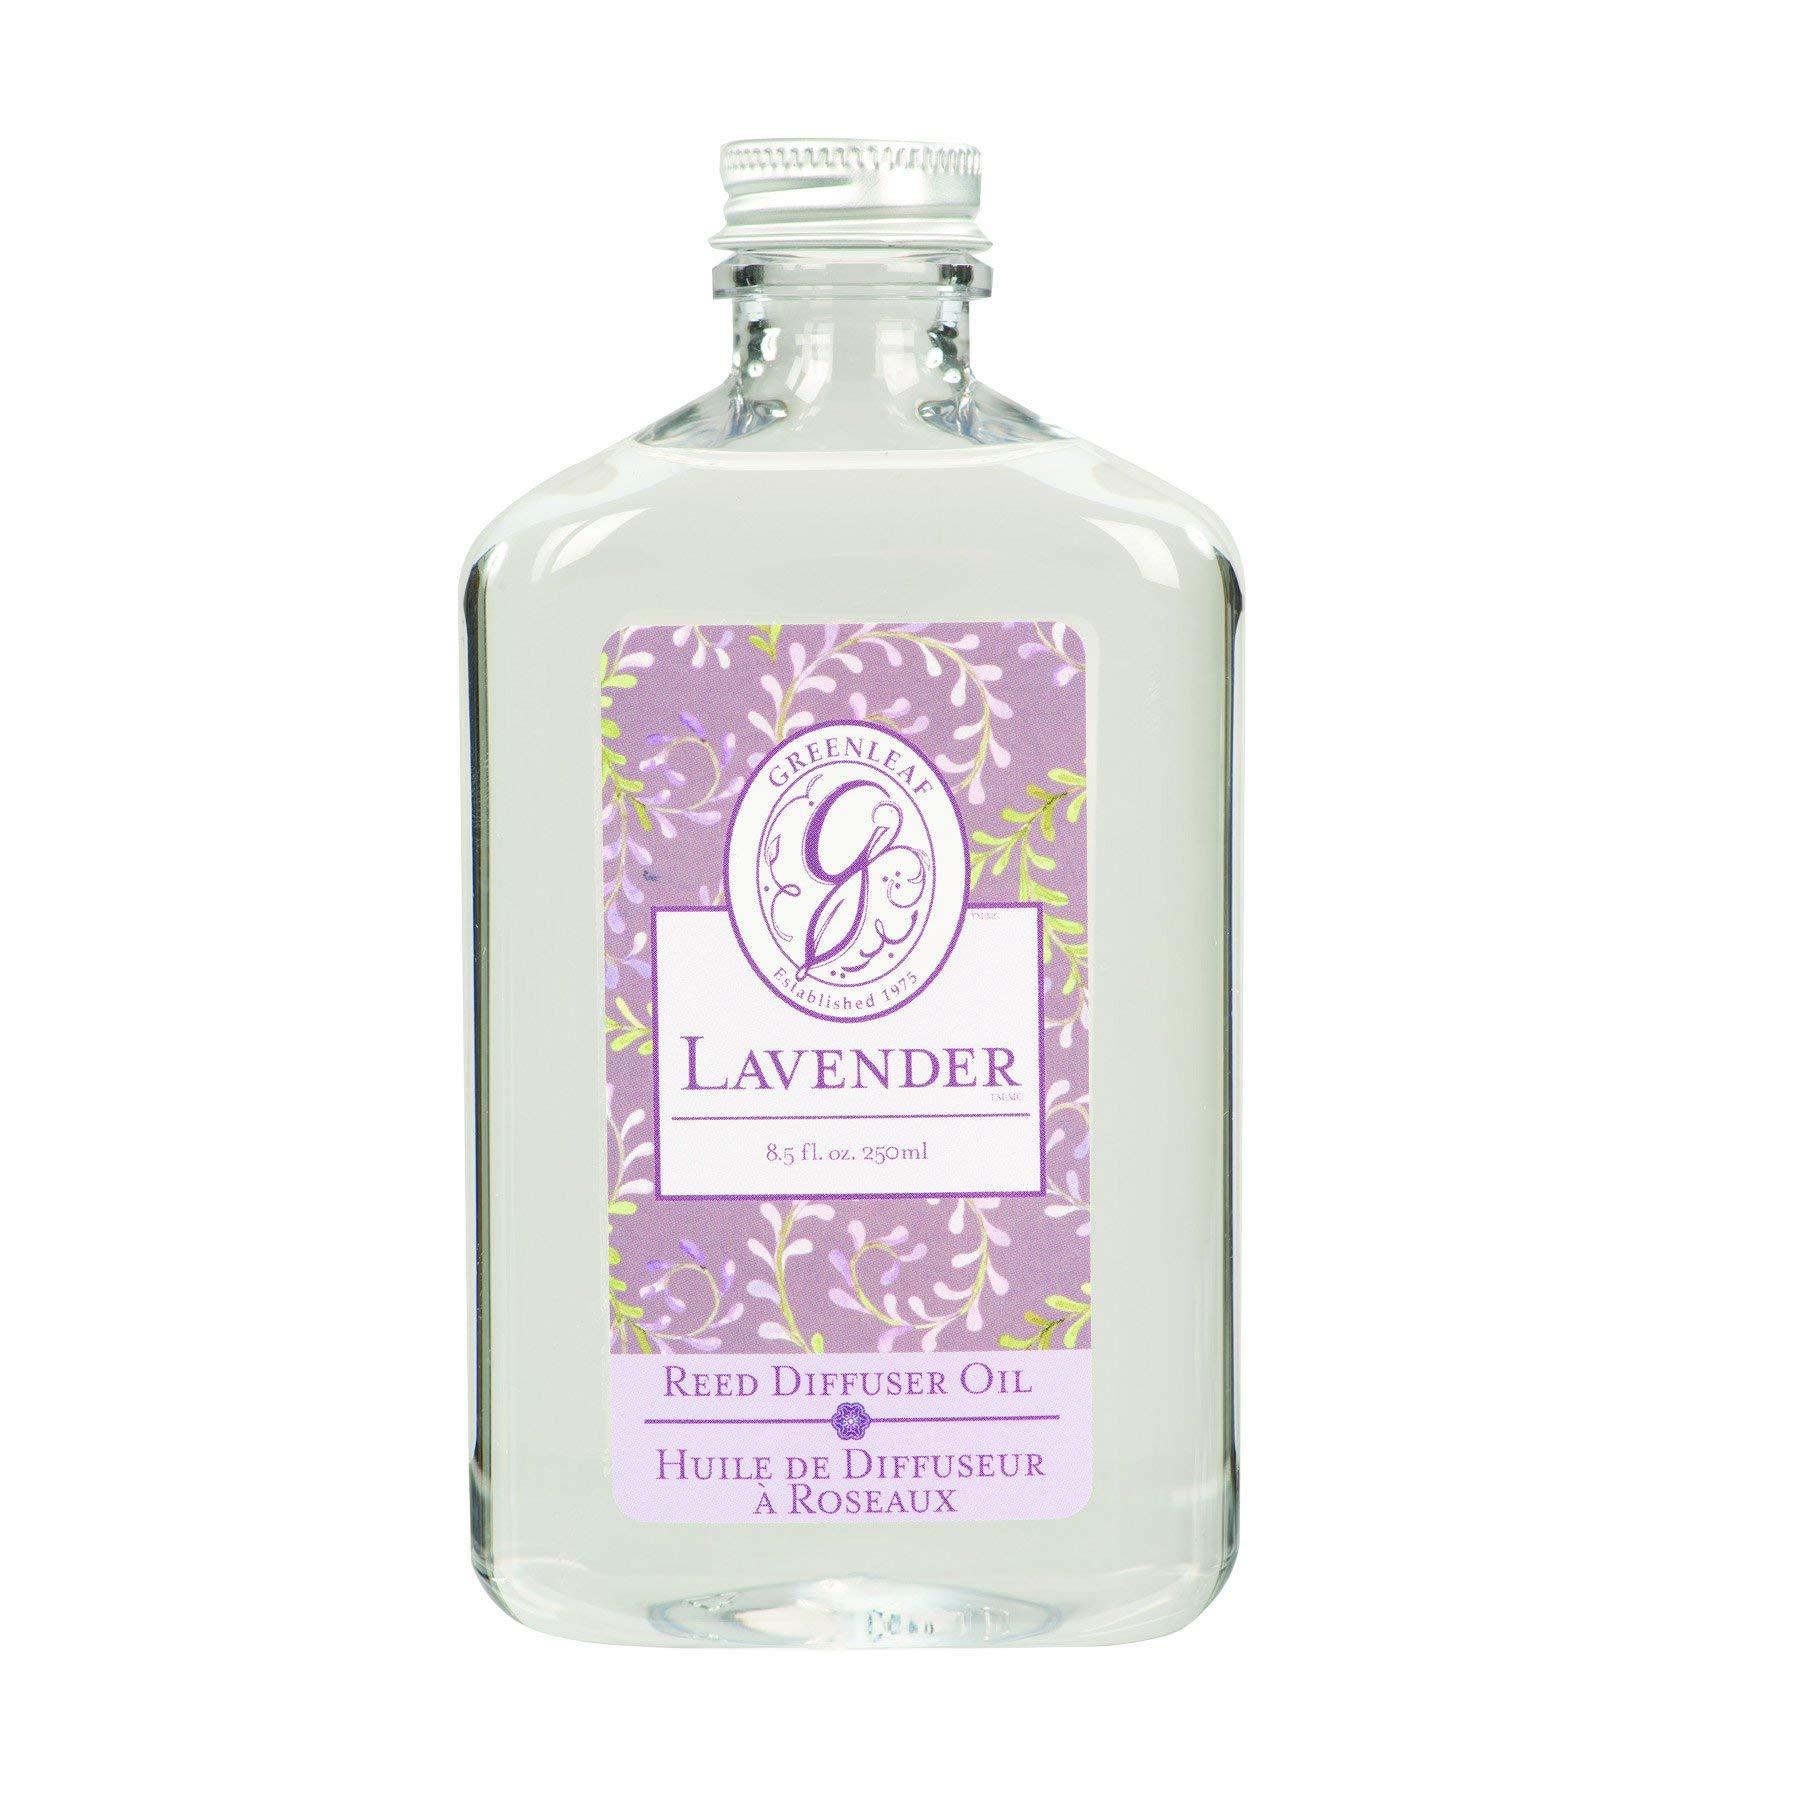 Greenleaf Signature Reed Diffuser Lavender